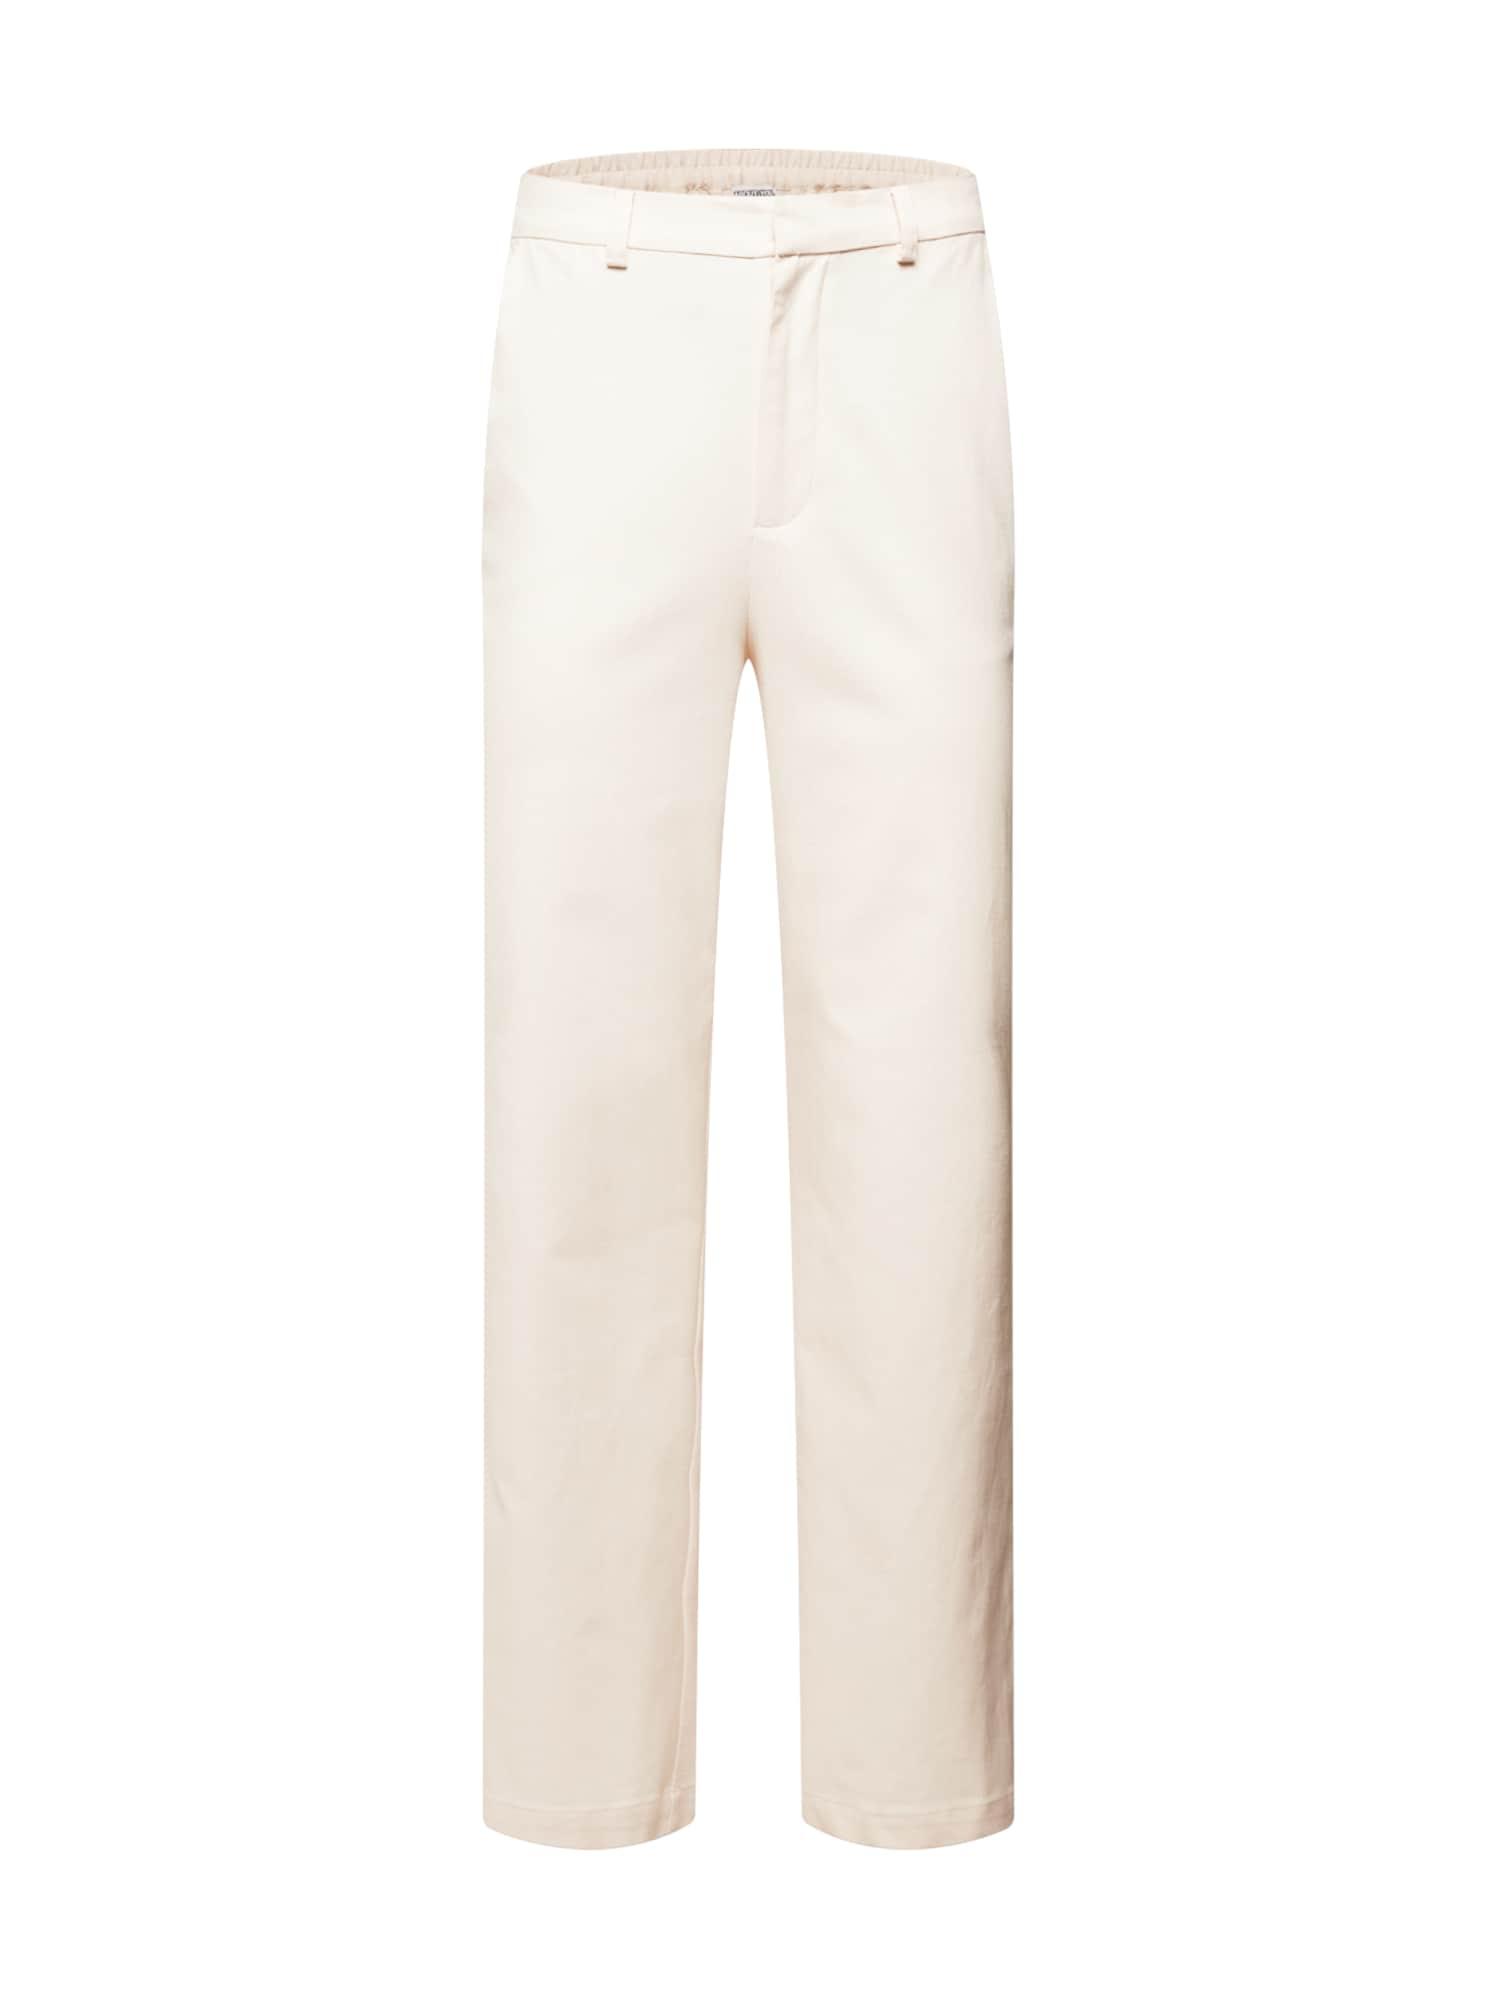 ABOUT YOU Limited Pantalon 'Mika'  - Blanc - Taille: XXL - male